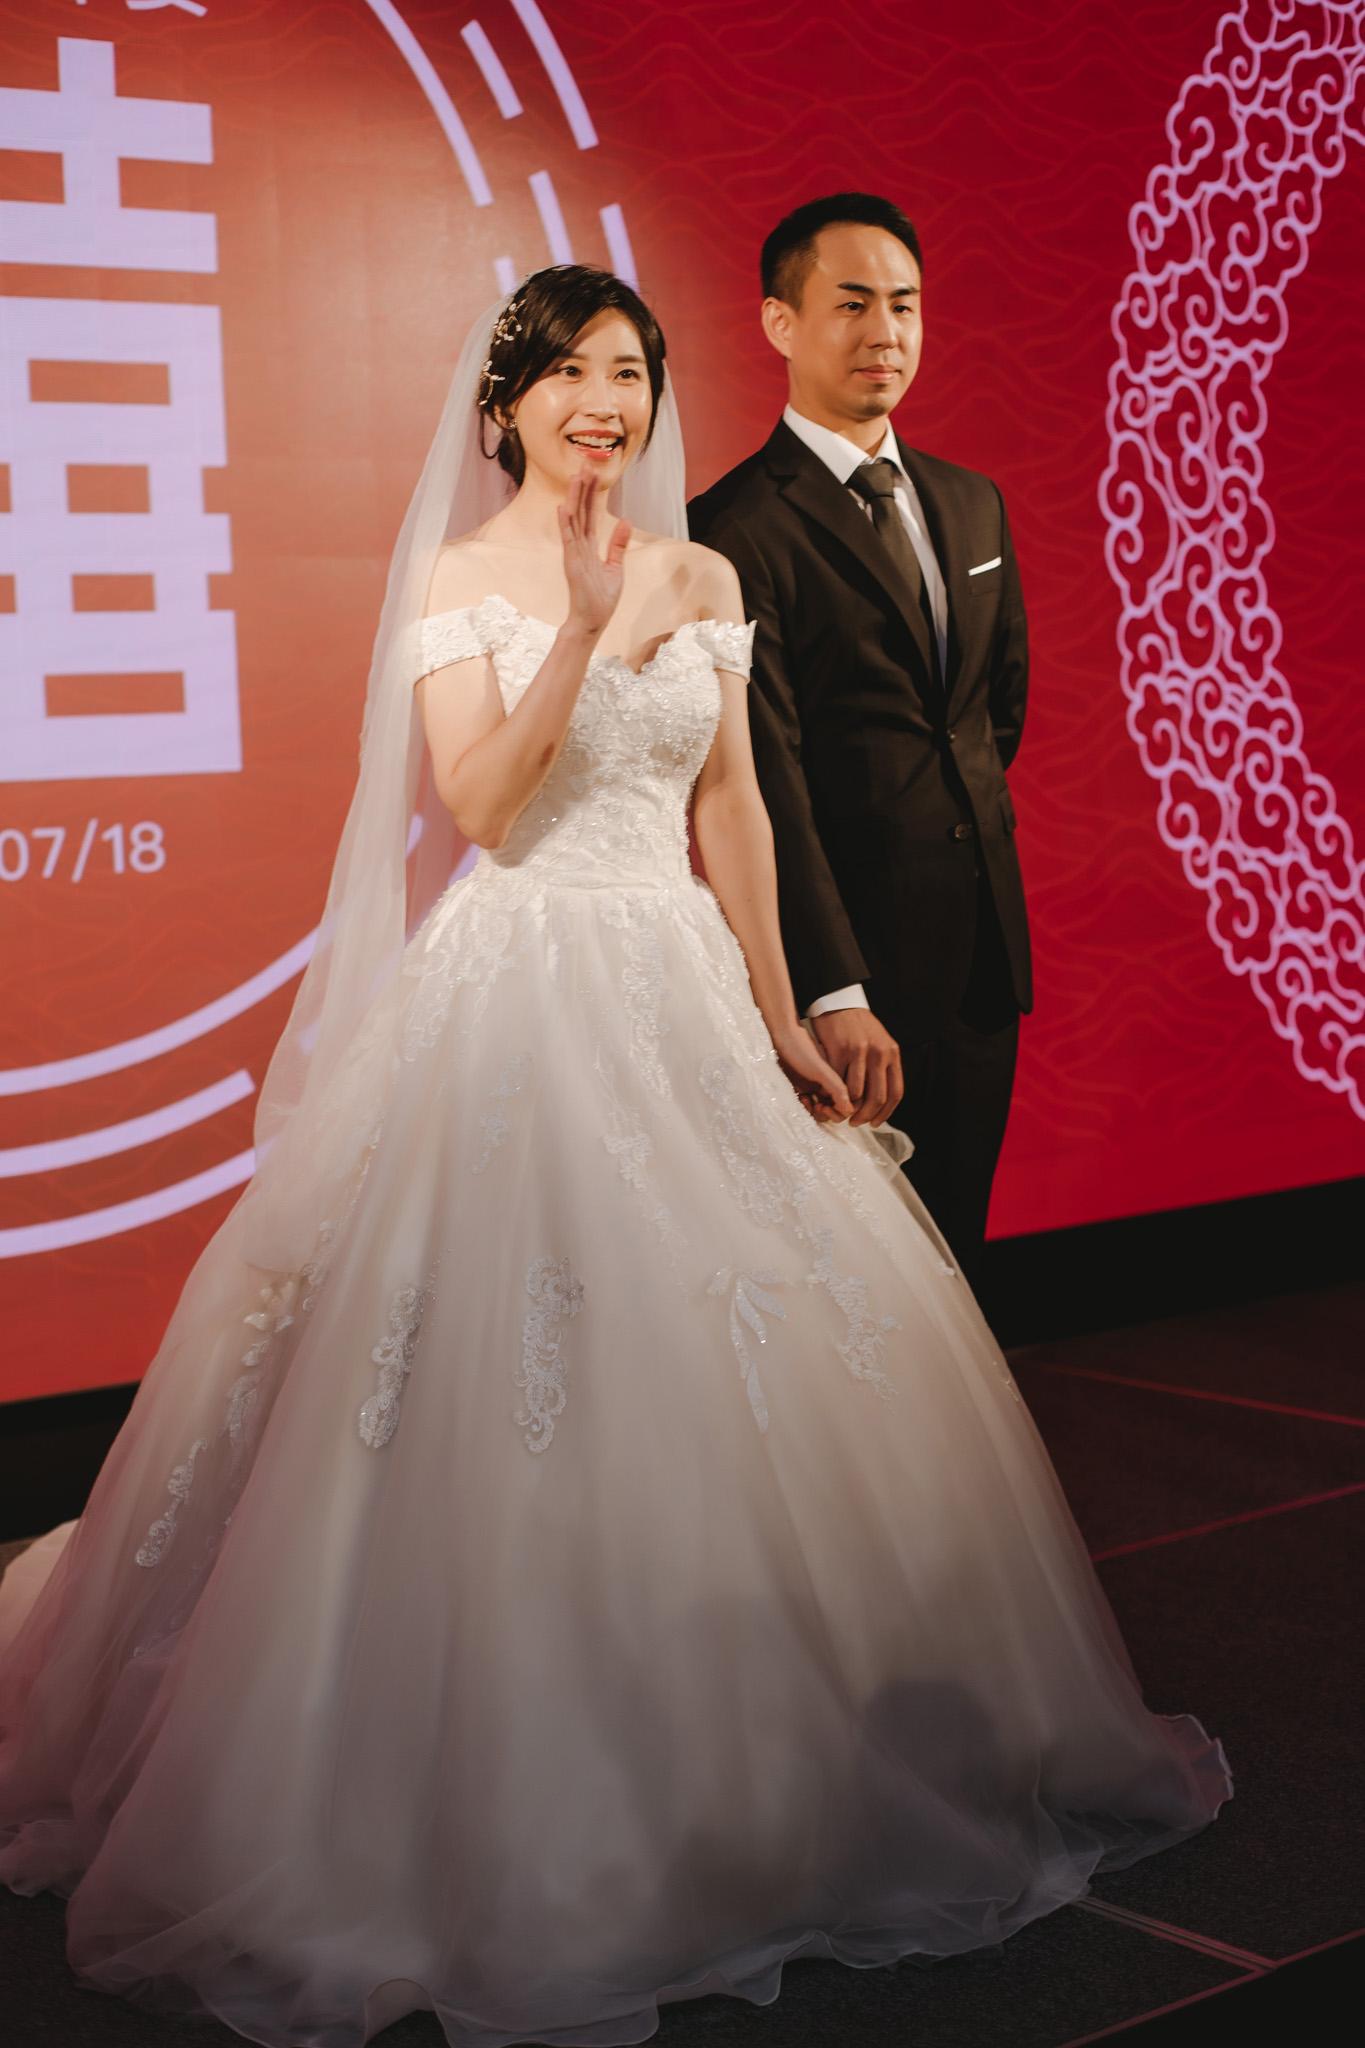 EW 居米 台北禮服 台北婚紗 台北婚攝 國泰萬怡 台北婚禮-26